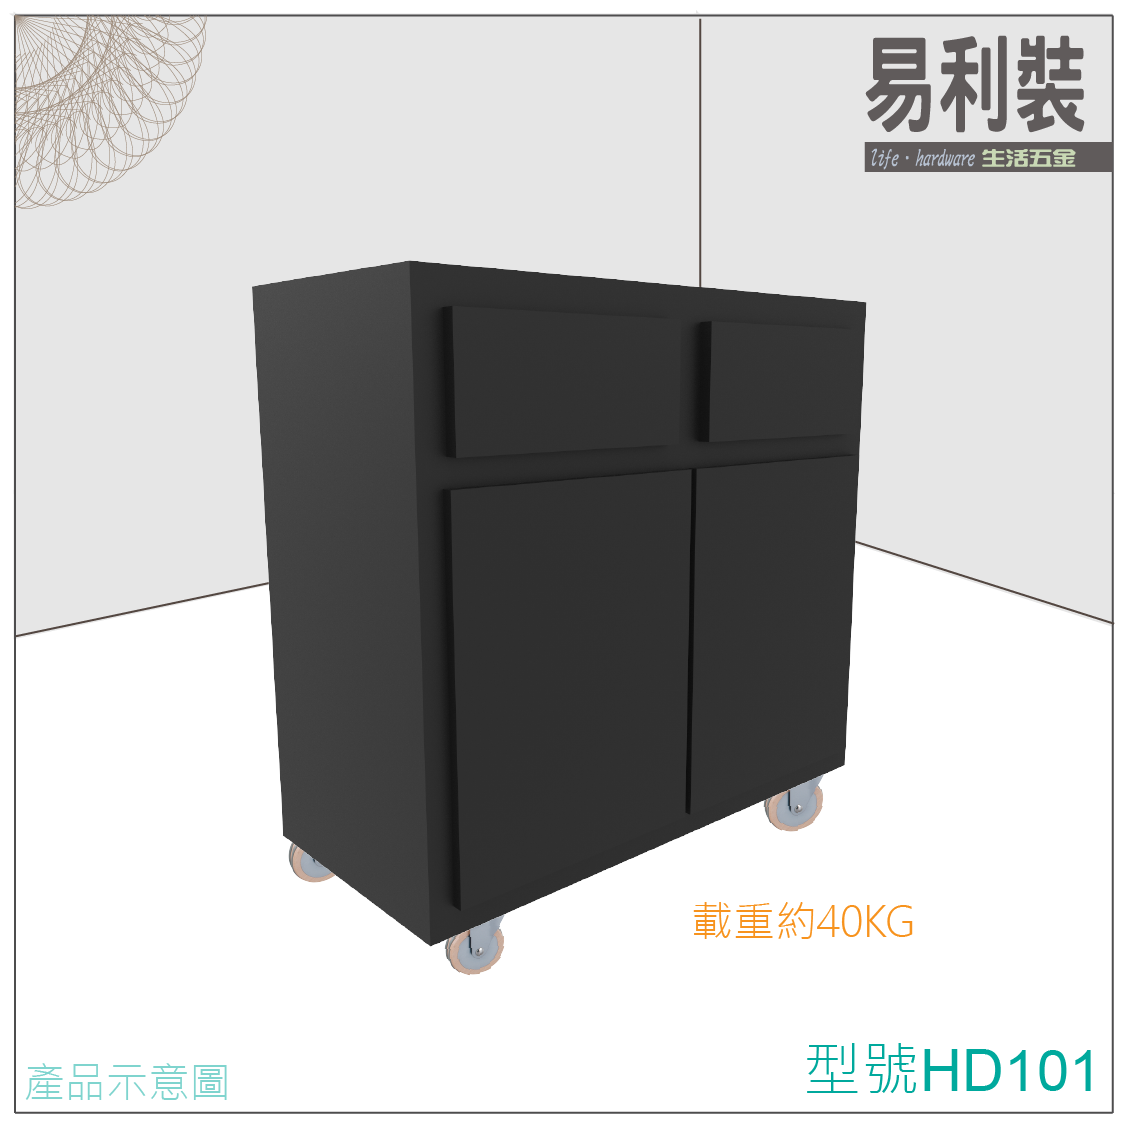 【 EASYCAN  】HD101 活動輪 易利裝生活五金 桌輪 櫃輪 房間 臥房 衣櫃 小資族 辦公家具 系統家具 2